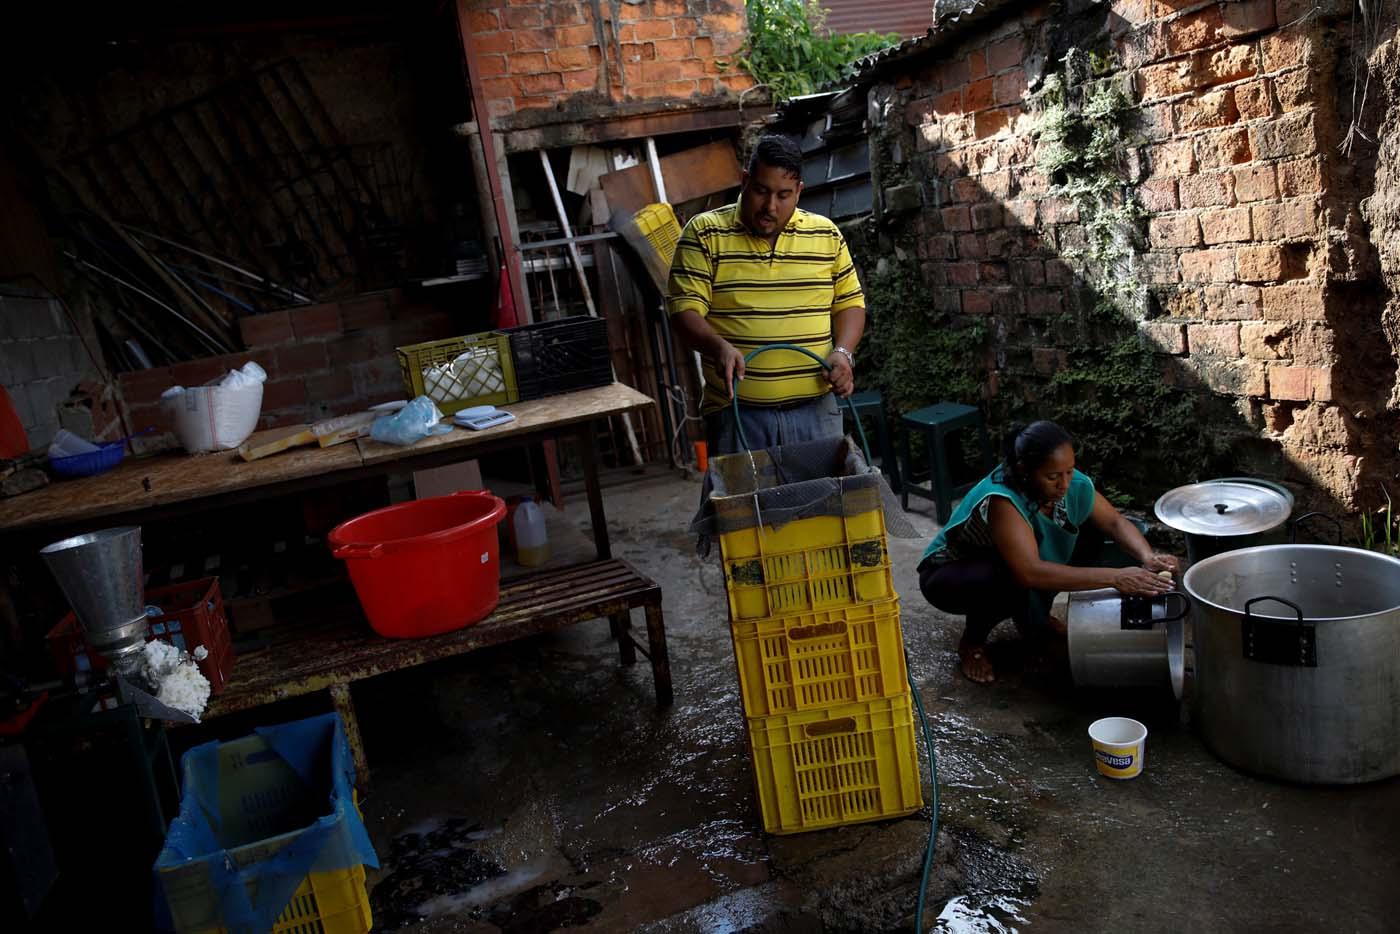 Medical equipment repairman Leandro Colmenares (C) makes corn dough at the backyard of his house in Caracas, Venezuela October 3, 2017. Picture taken October 3, 2017. REUTERS/Carlos Garcia Rawlins